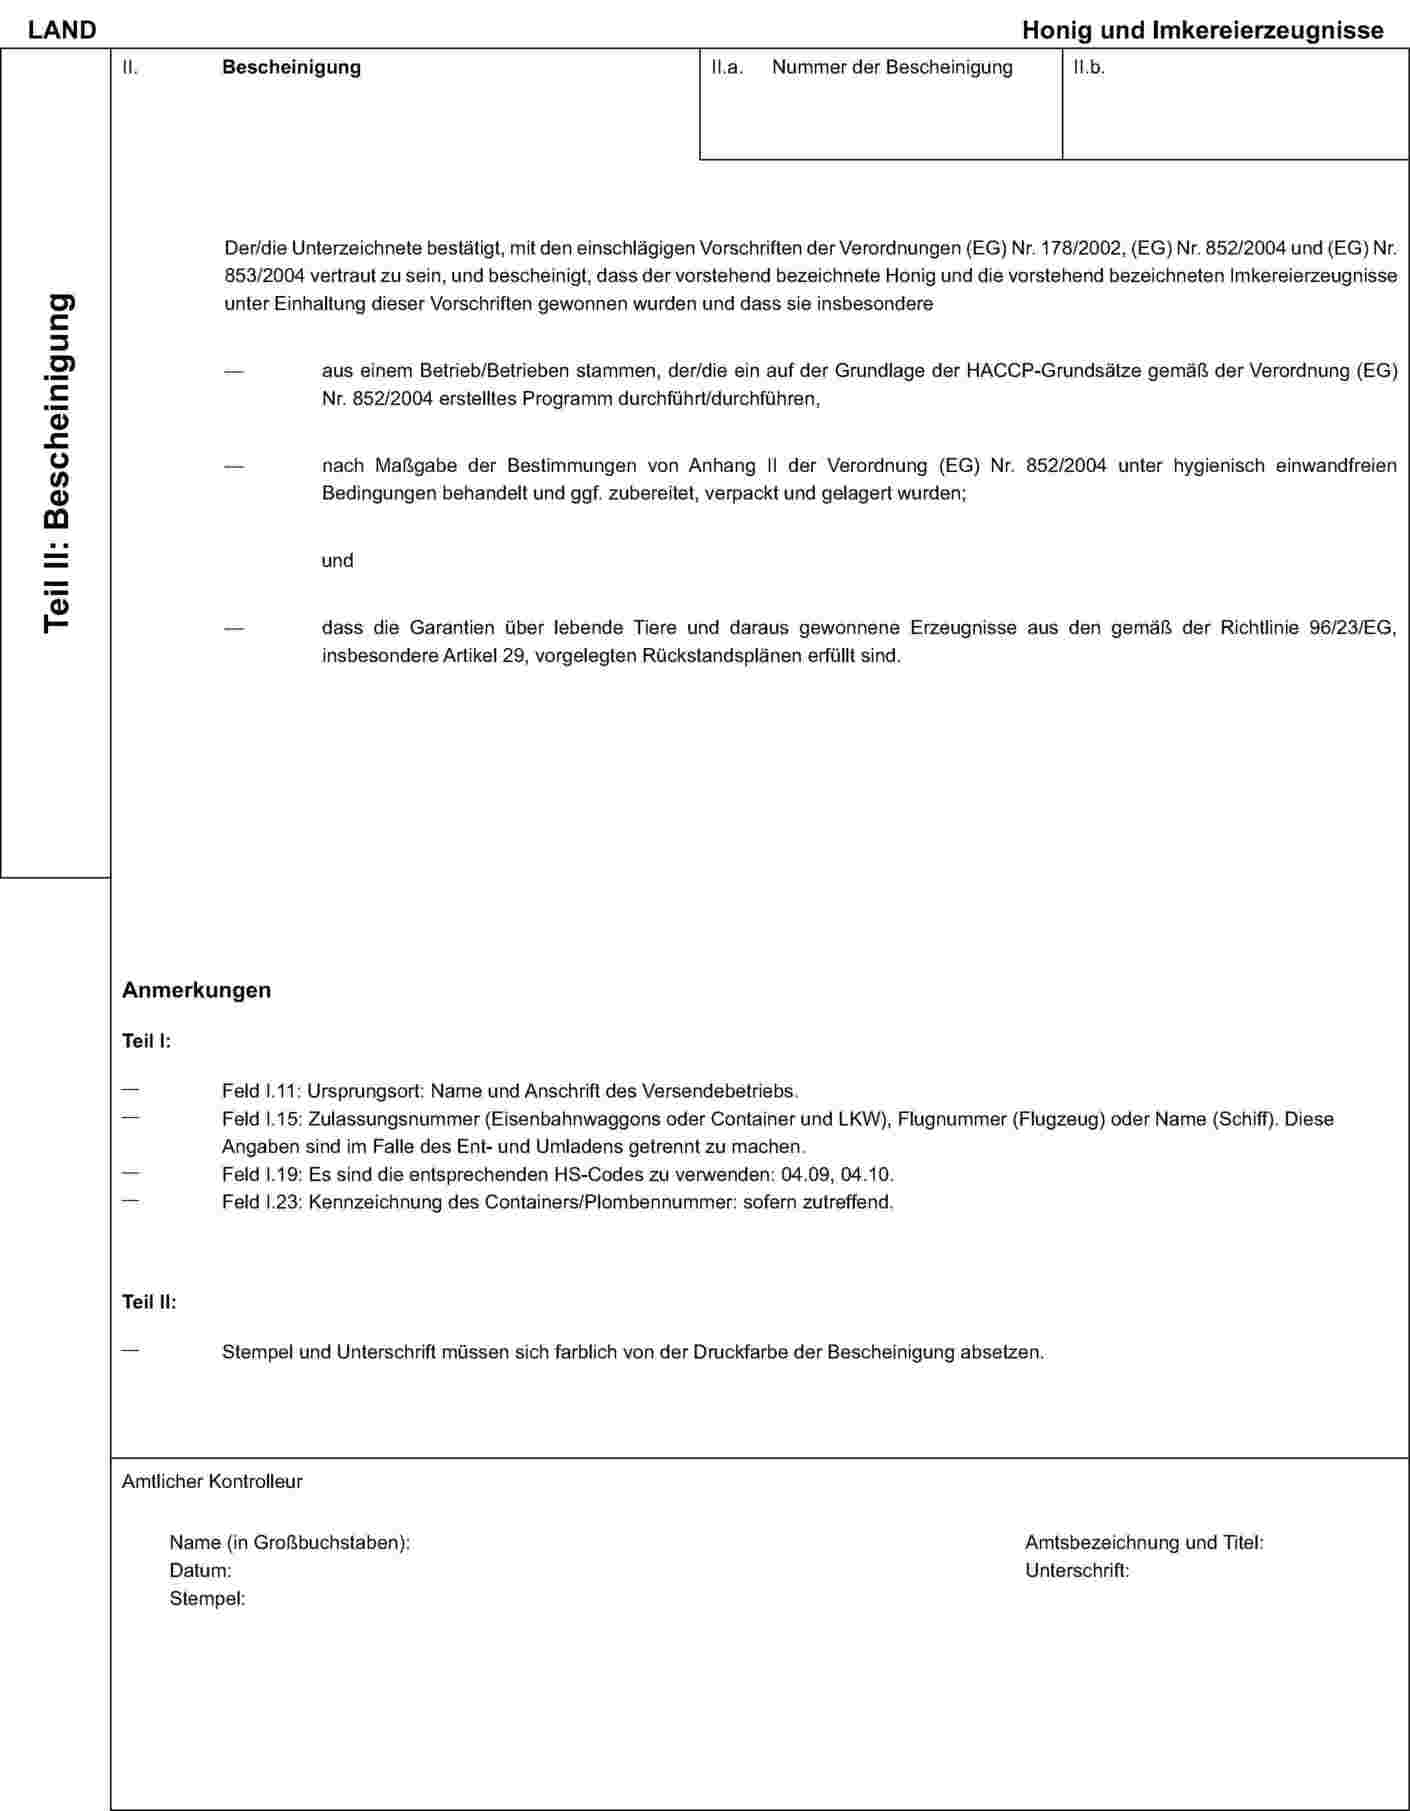 EUR-Lex - 32006R1664 - EN - EUR-Lex